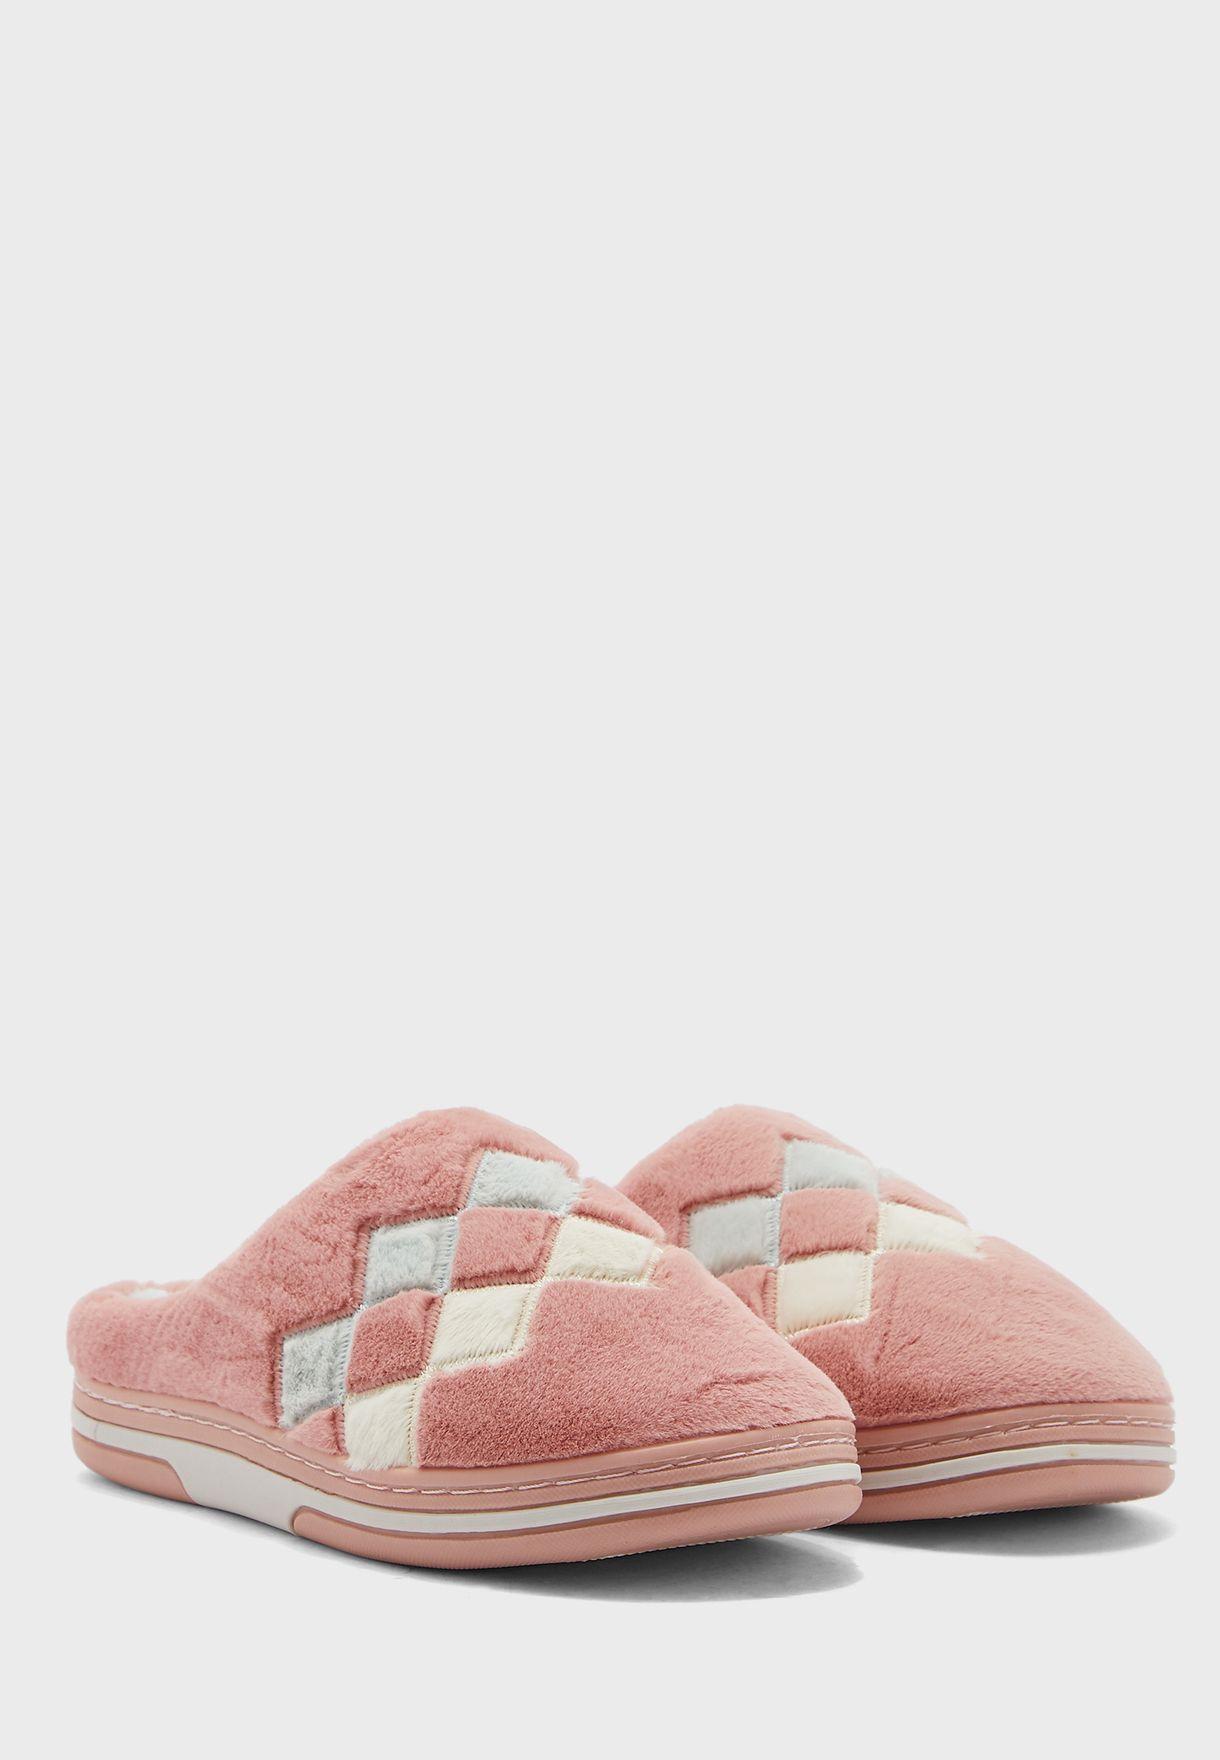 Diamond Pattern Bedroom Slippers